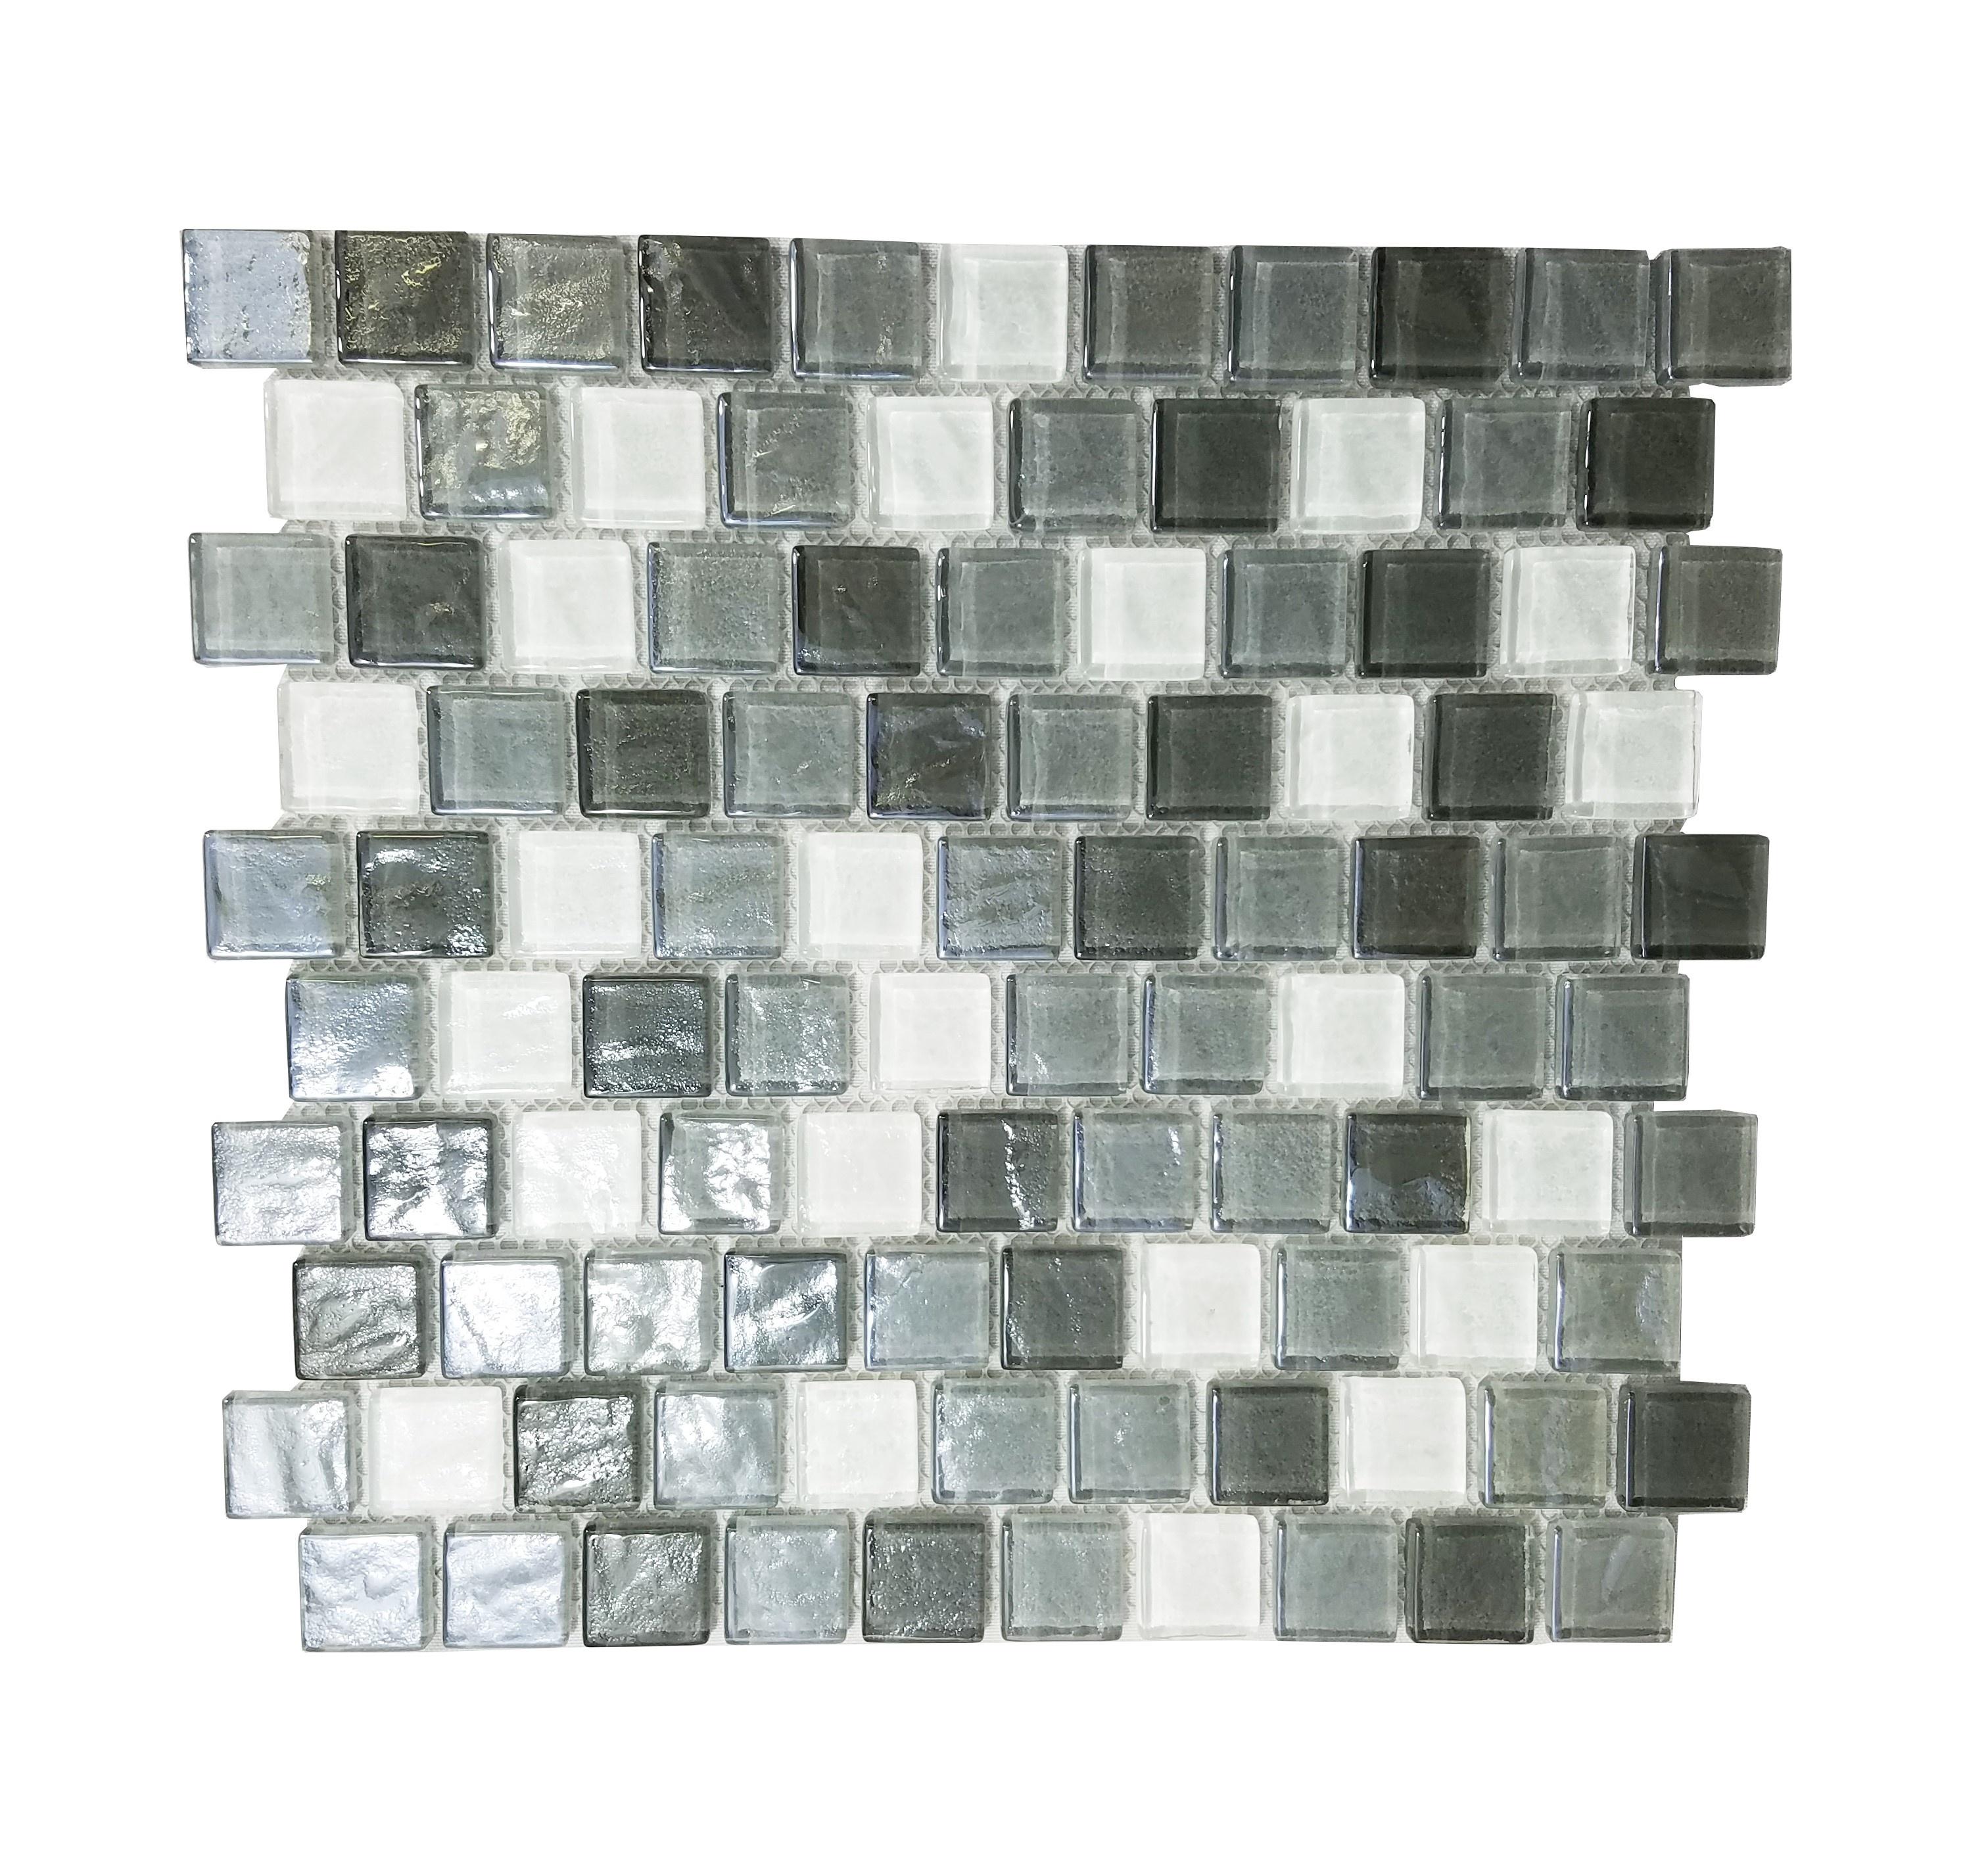 "Geo 1"" x 1"" Textured Gray Glass Square Backsplash Mosaic Wall Tile"